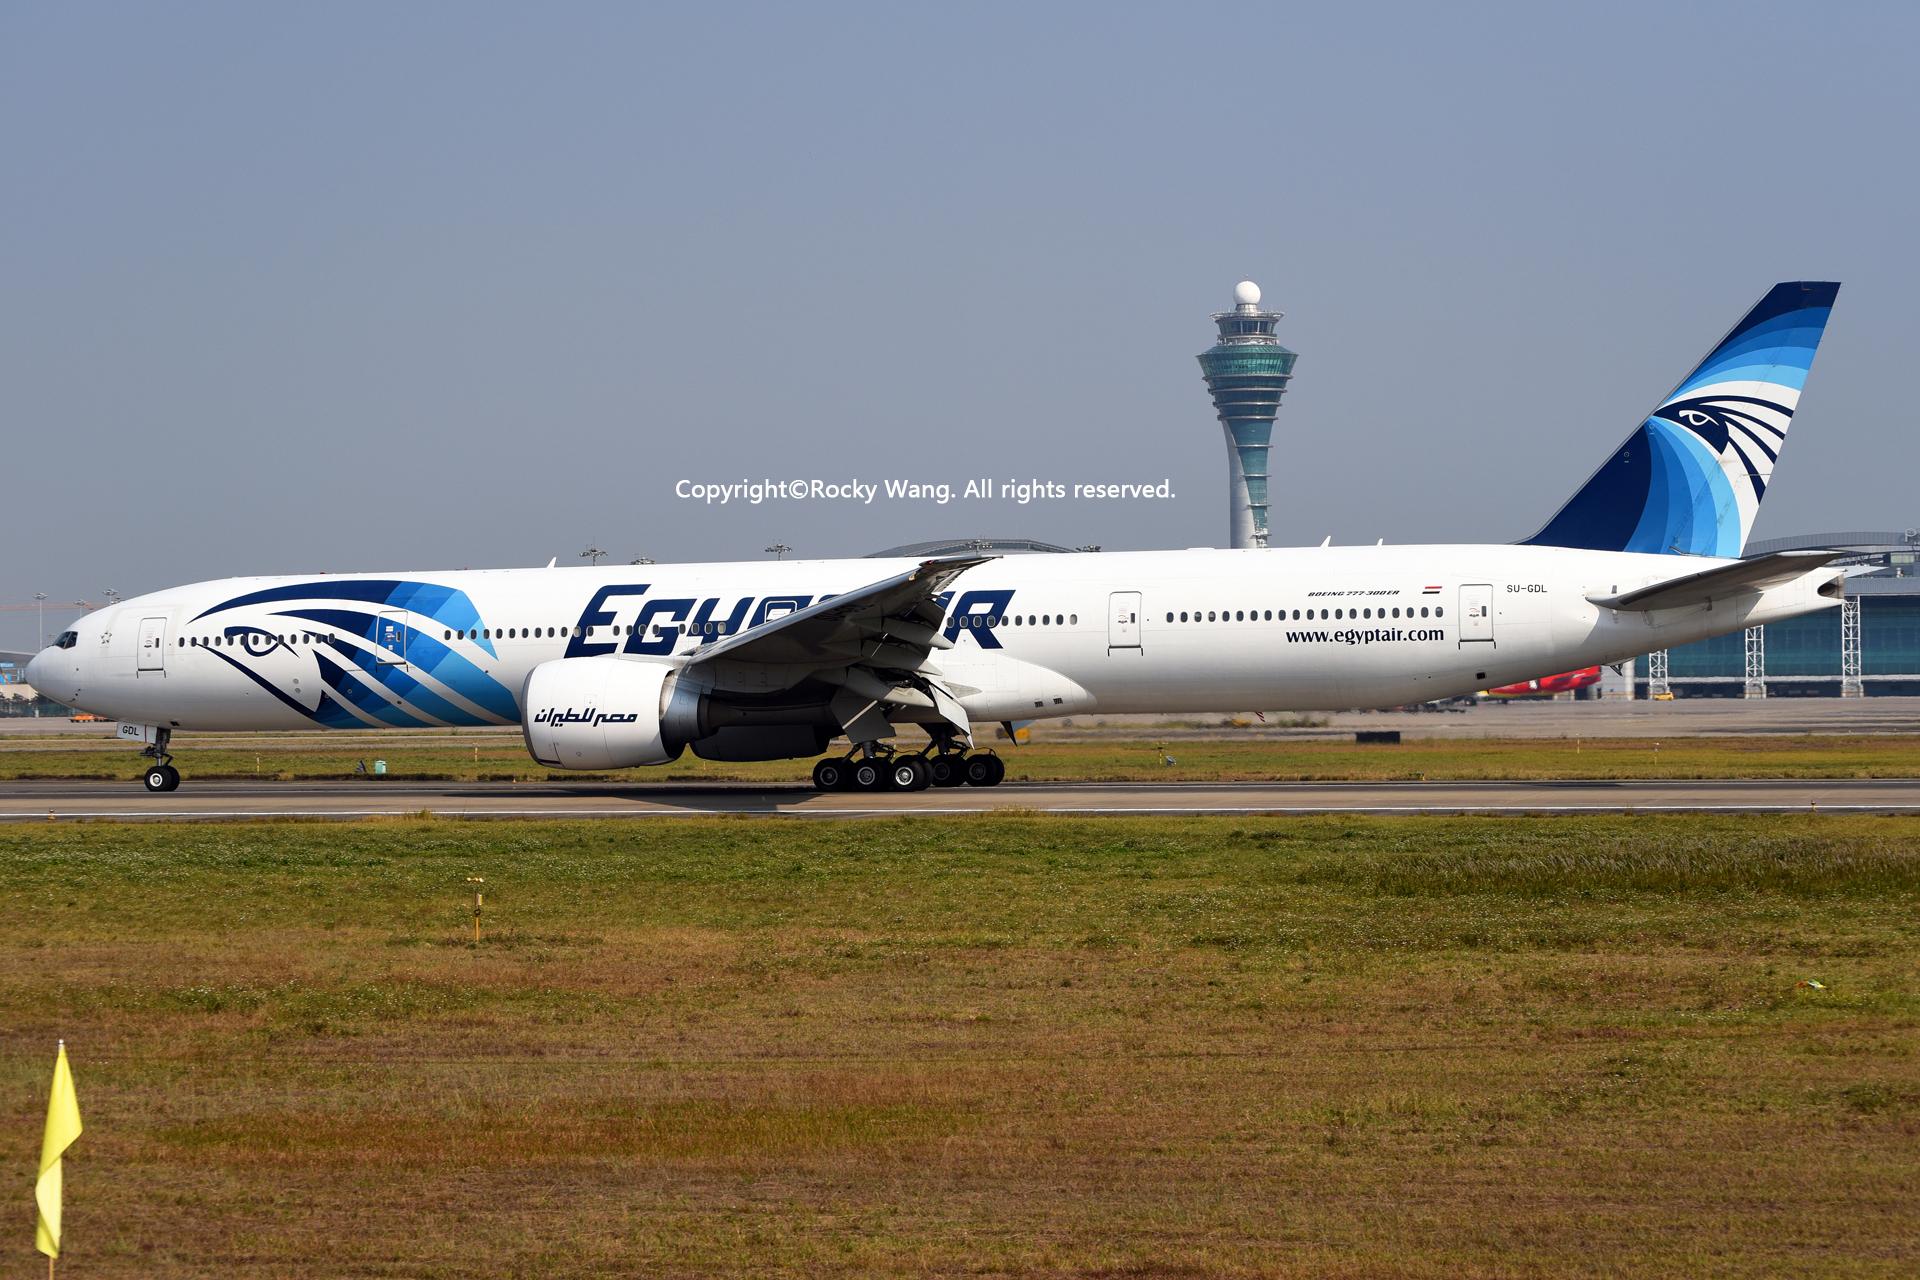 Re:[原创]居家了 批量处理老图 倾情奉献52家777 BOEING 777-36NER SU-GDL Aircraft: Boeing 777-36NER Serial #: 382